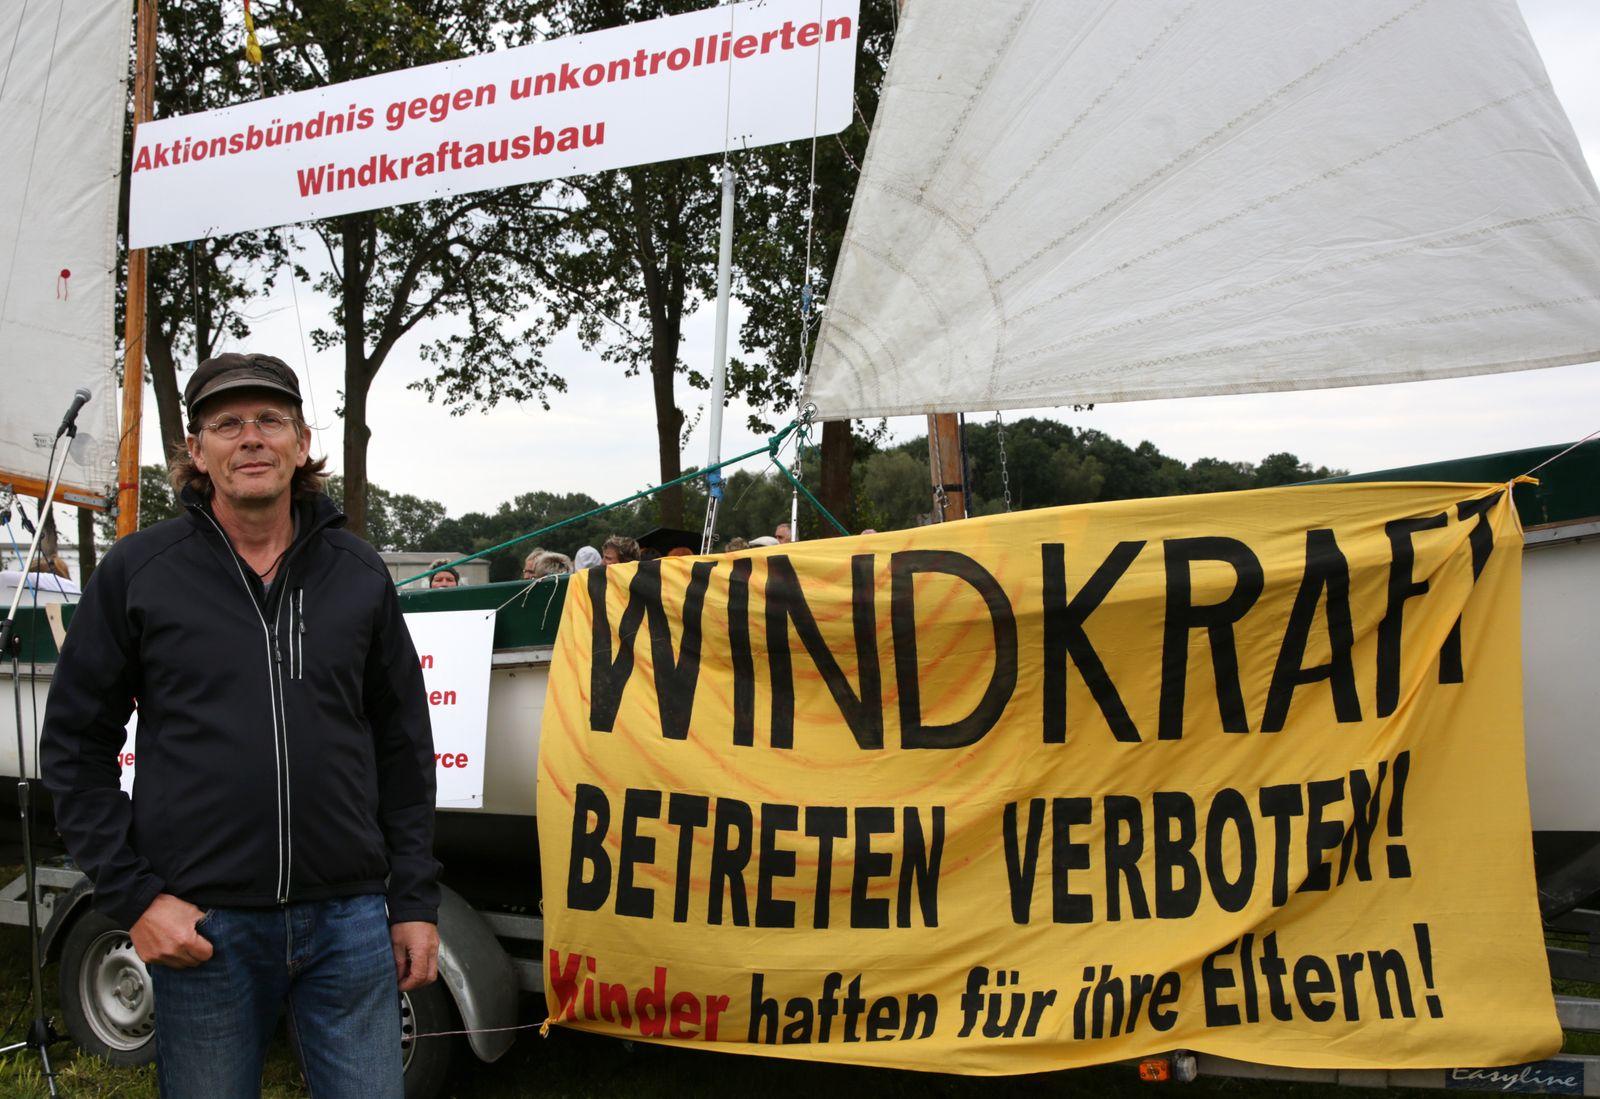 Windkraft; Protest